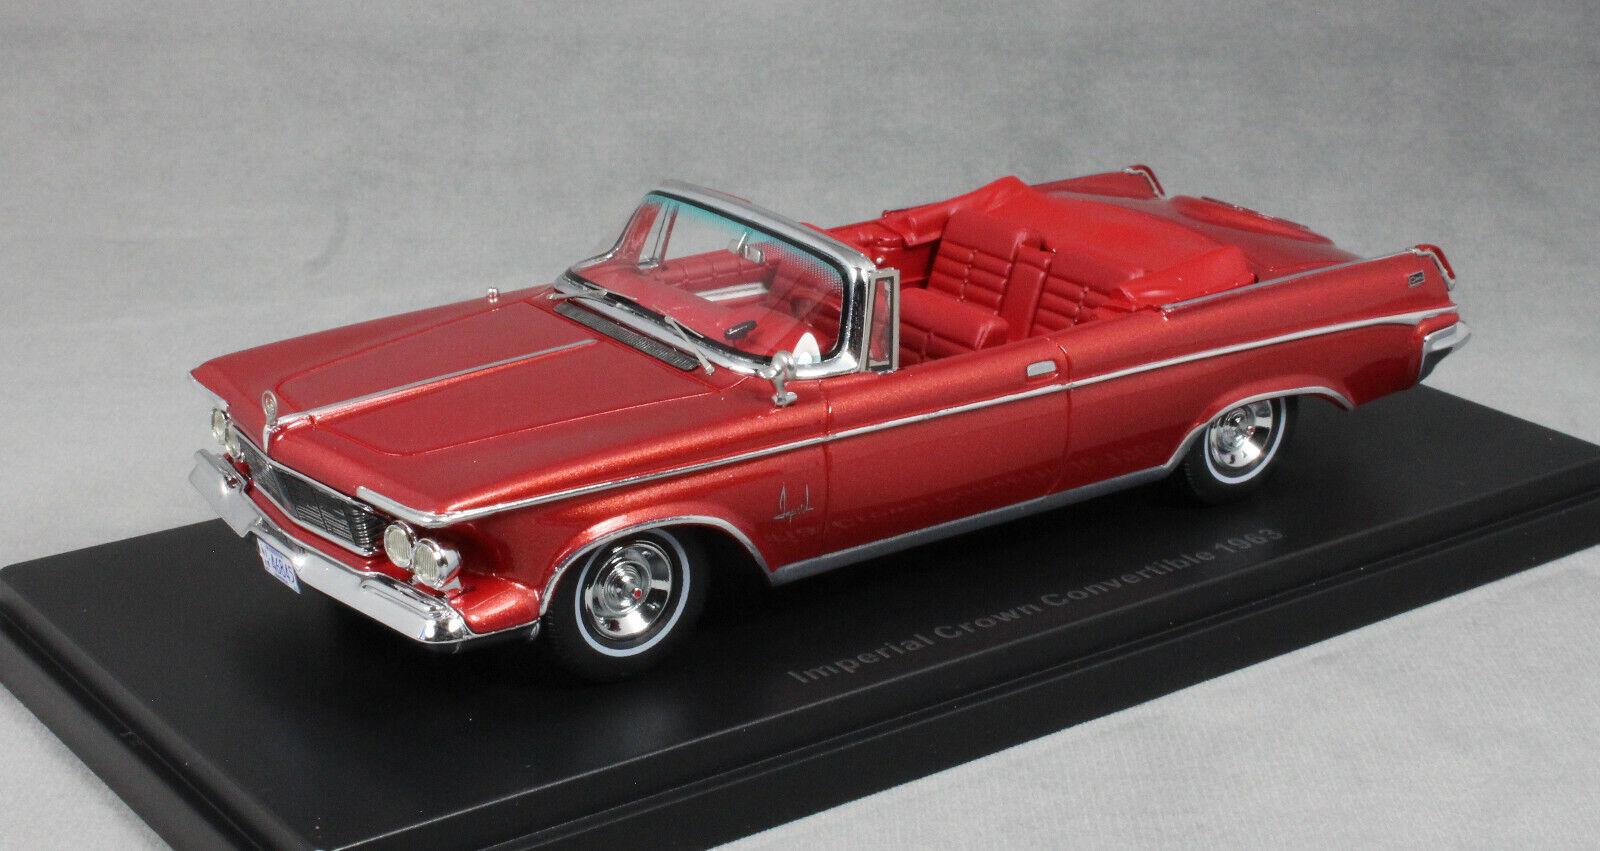 Neo Modells Imperial Crown ConGrünible in Dark rot Metallic 1963 44845 1 43 NEW